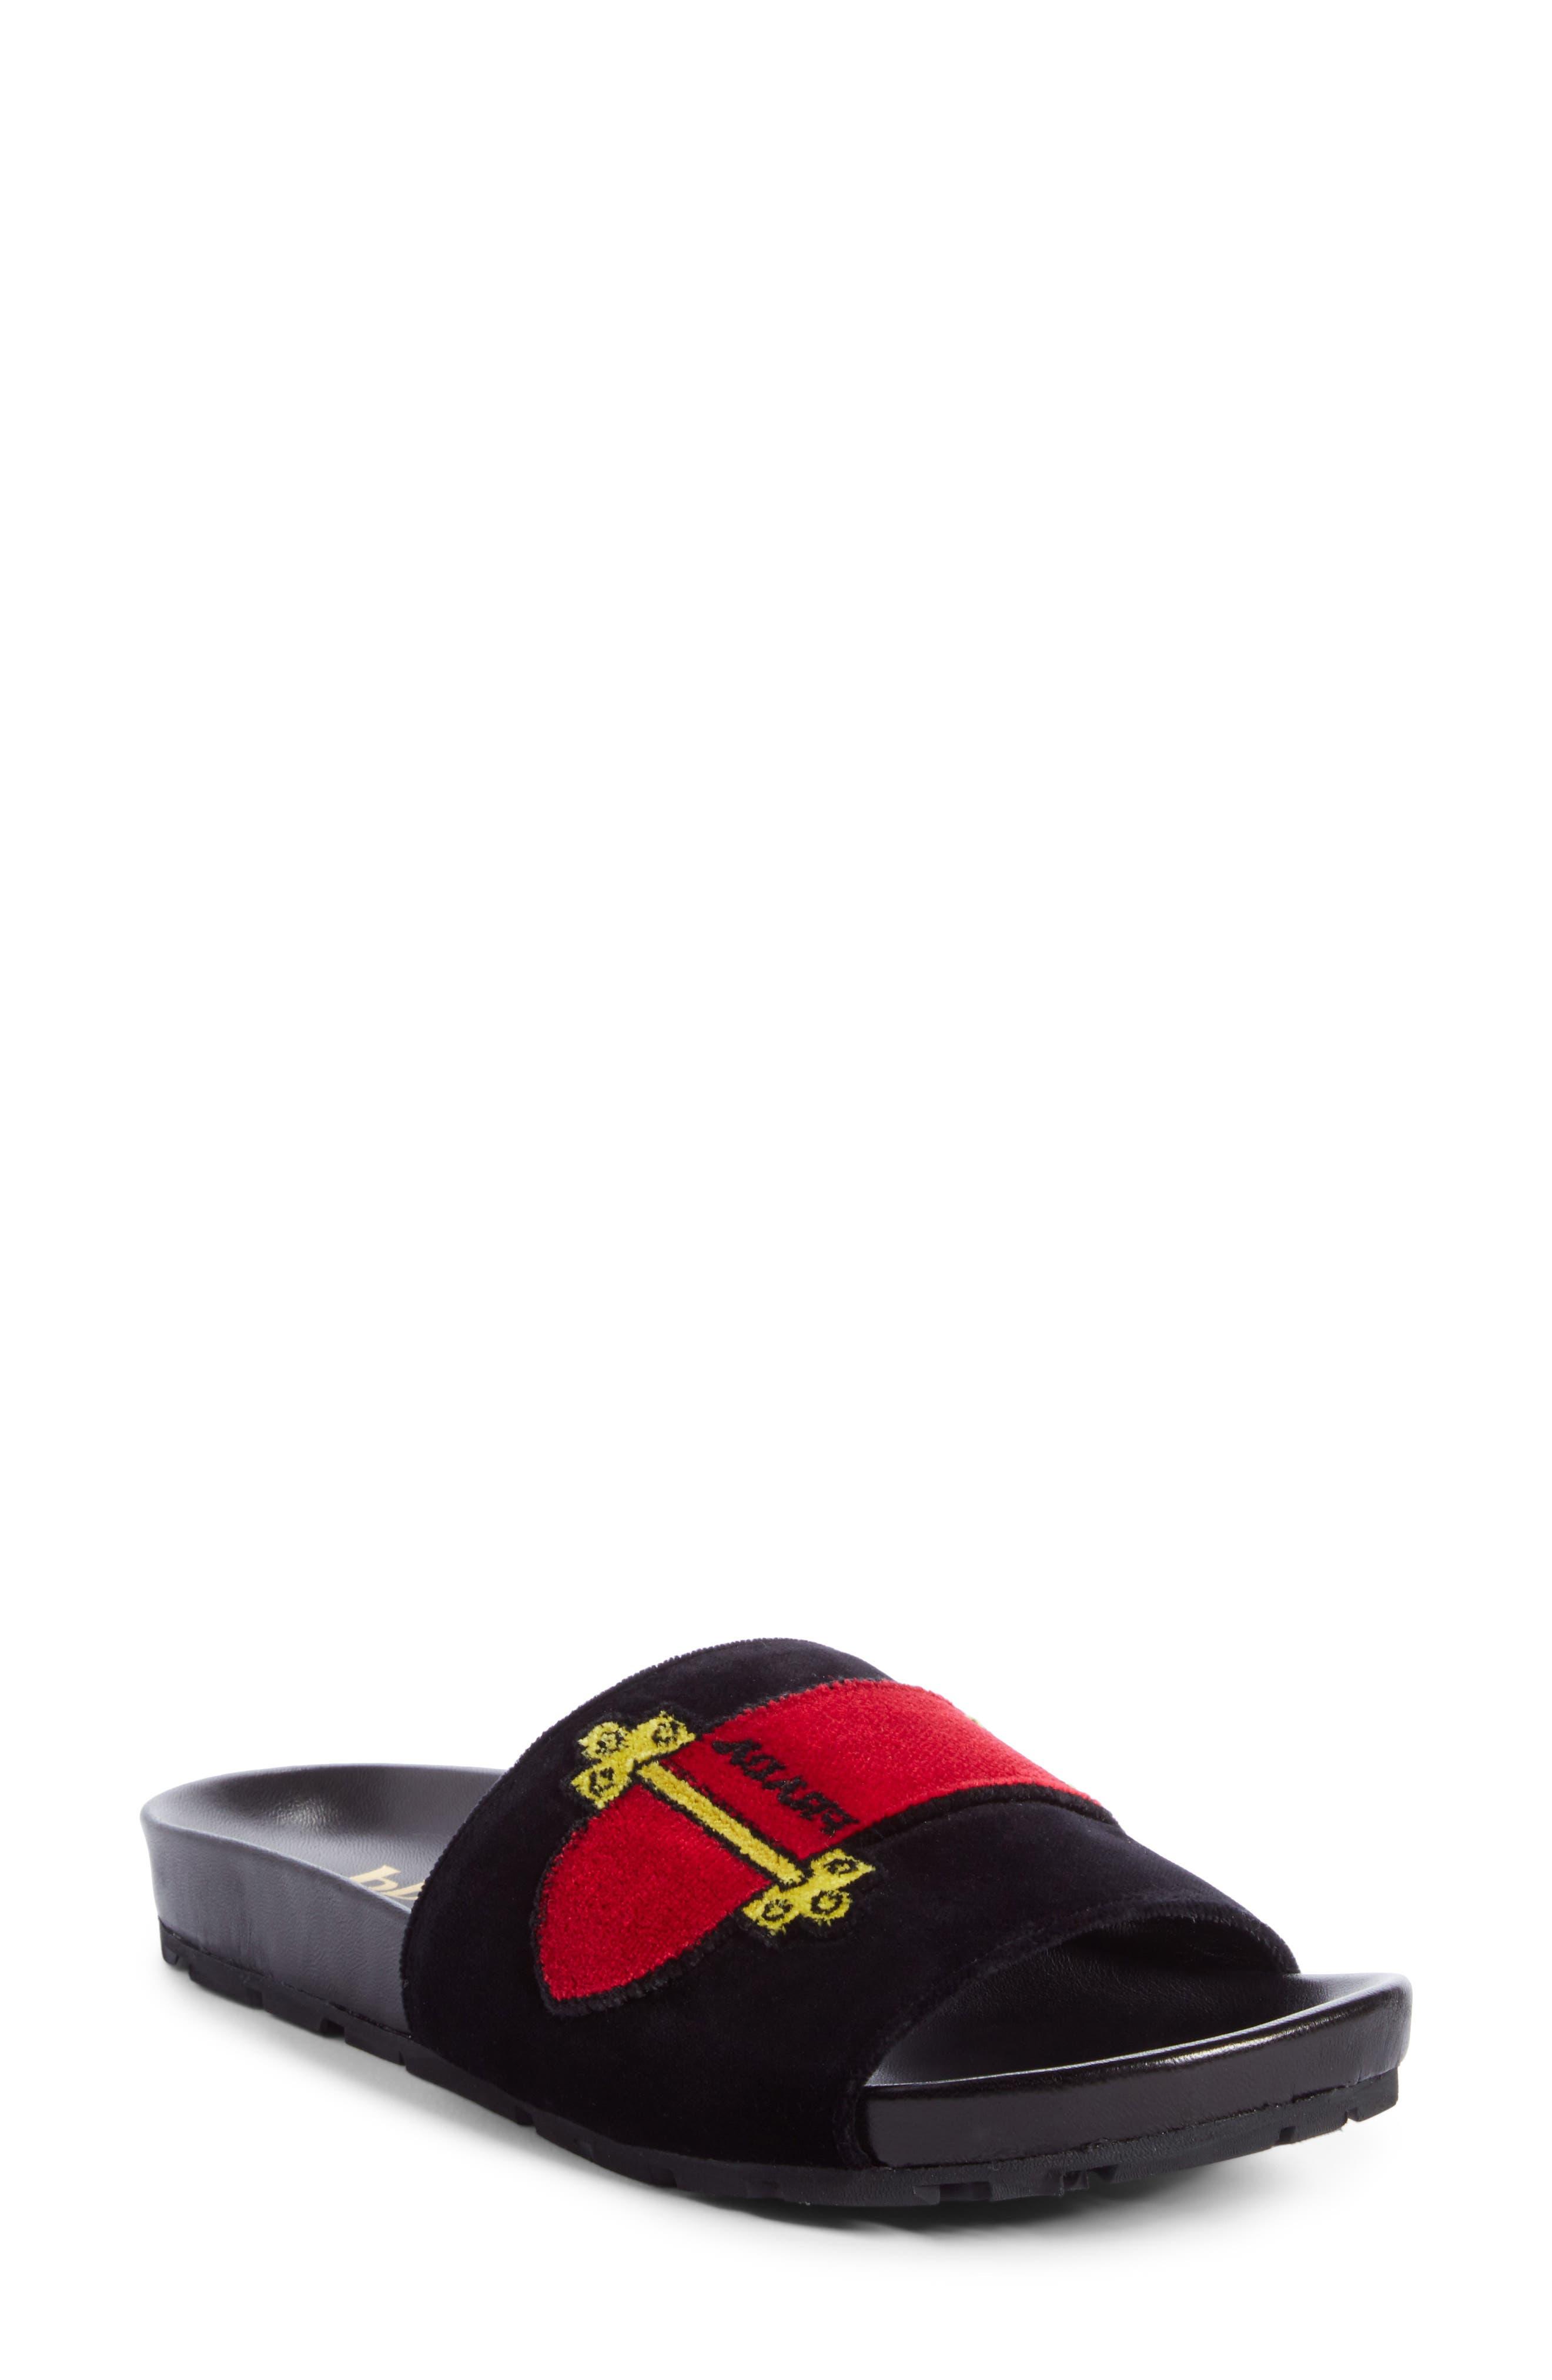 Main Image - Prada Logo Slide Sandal (Women)